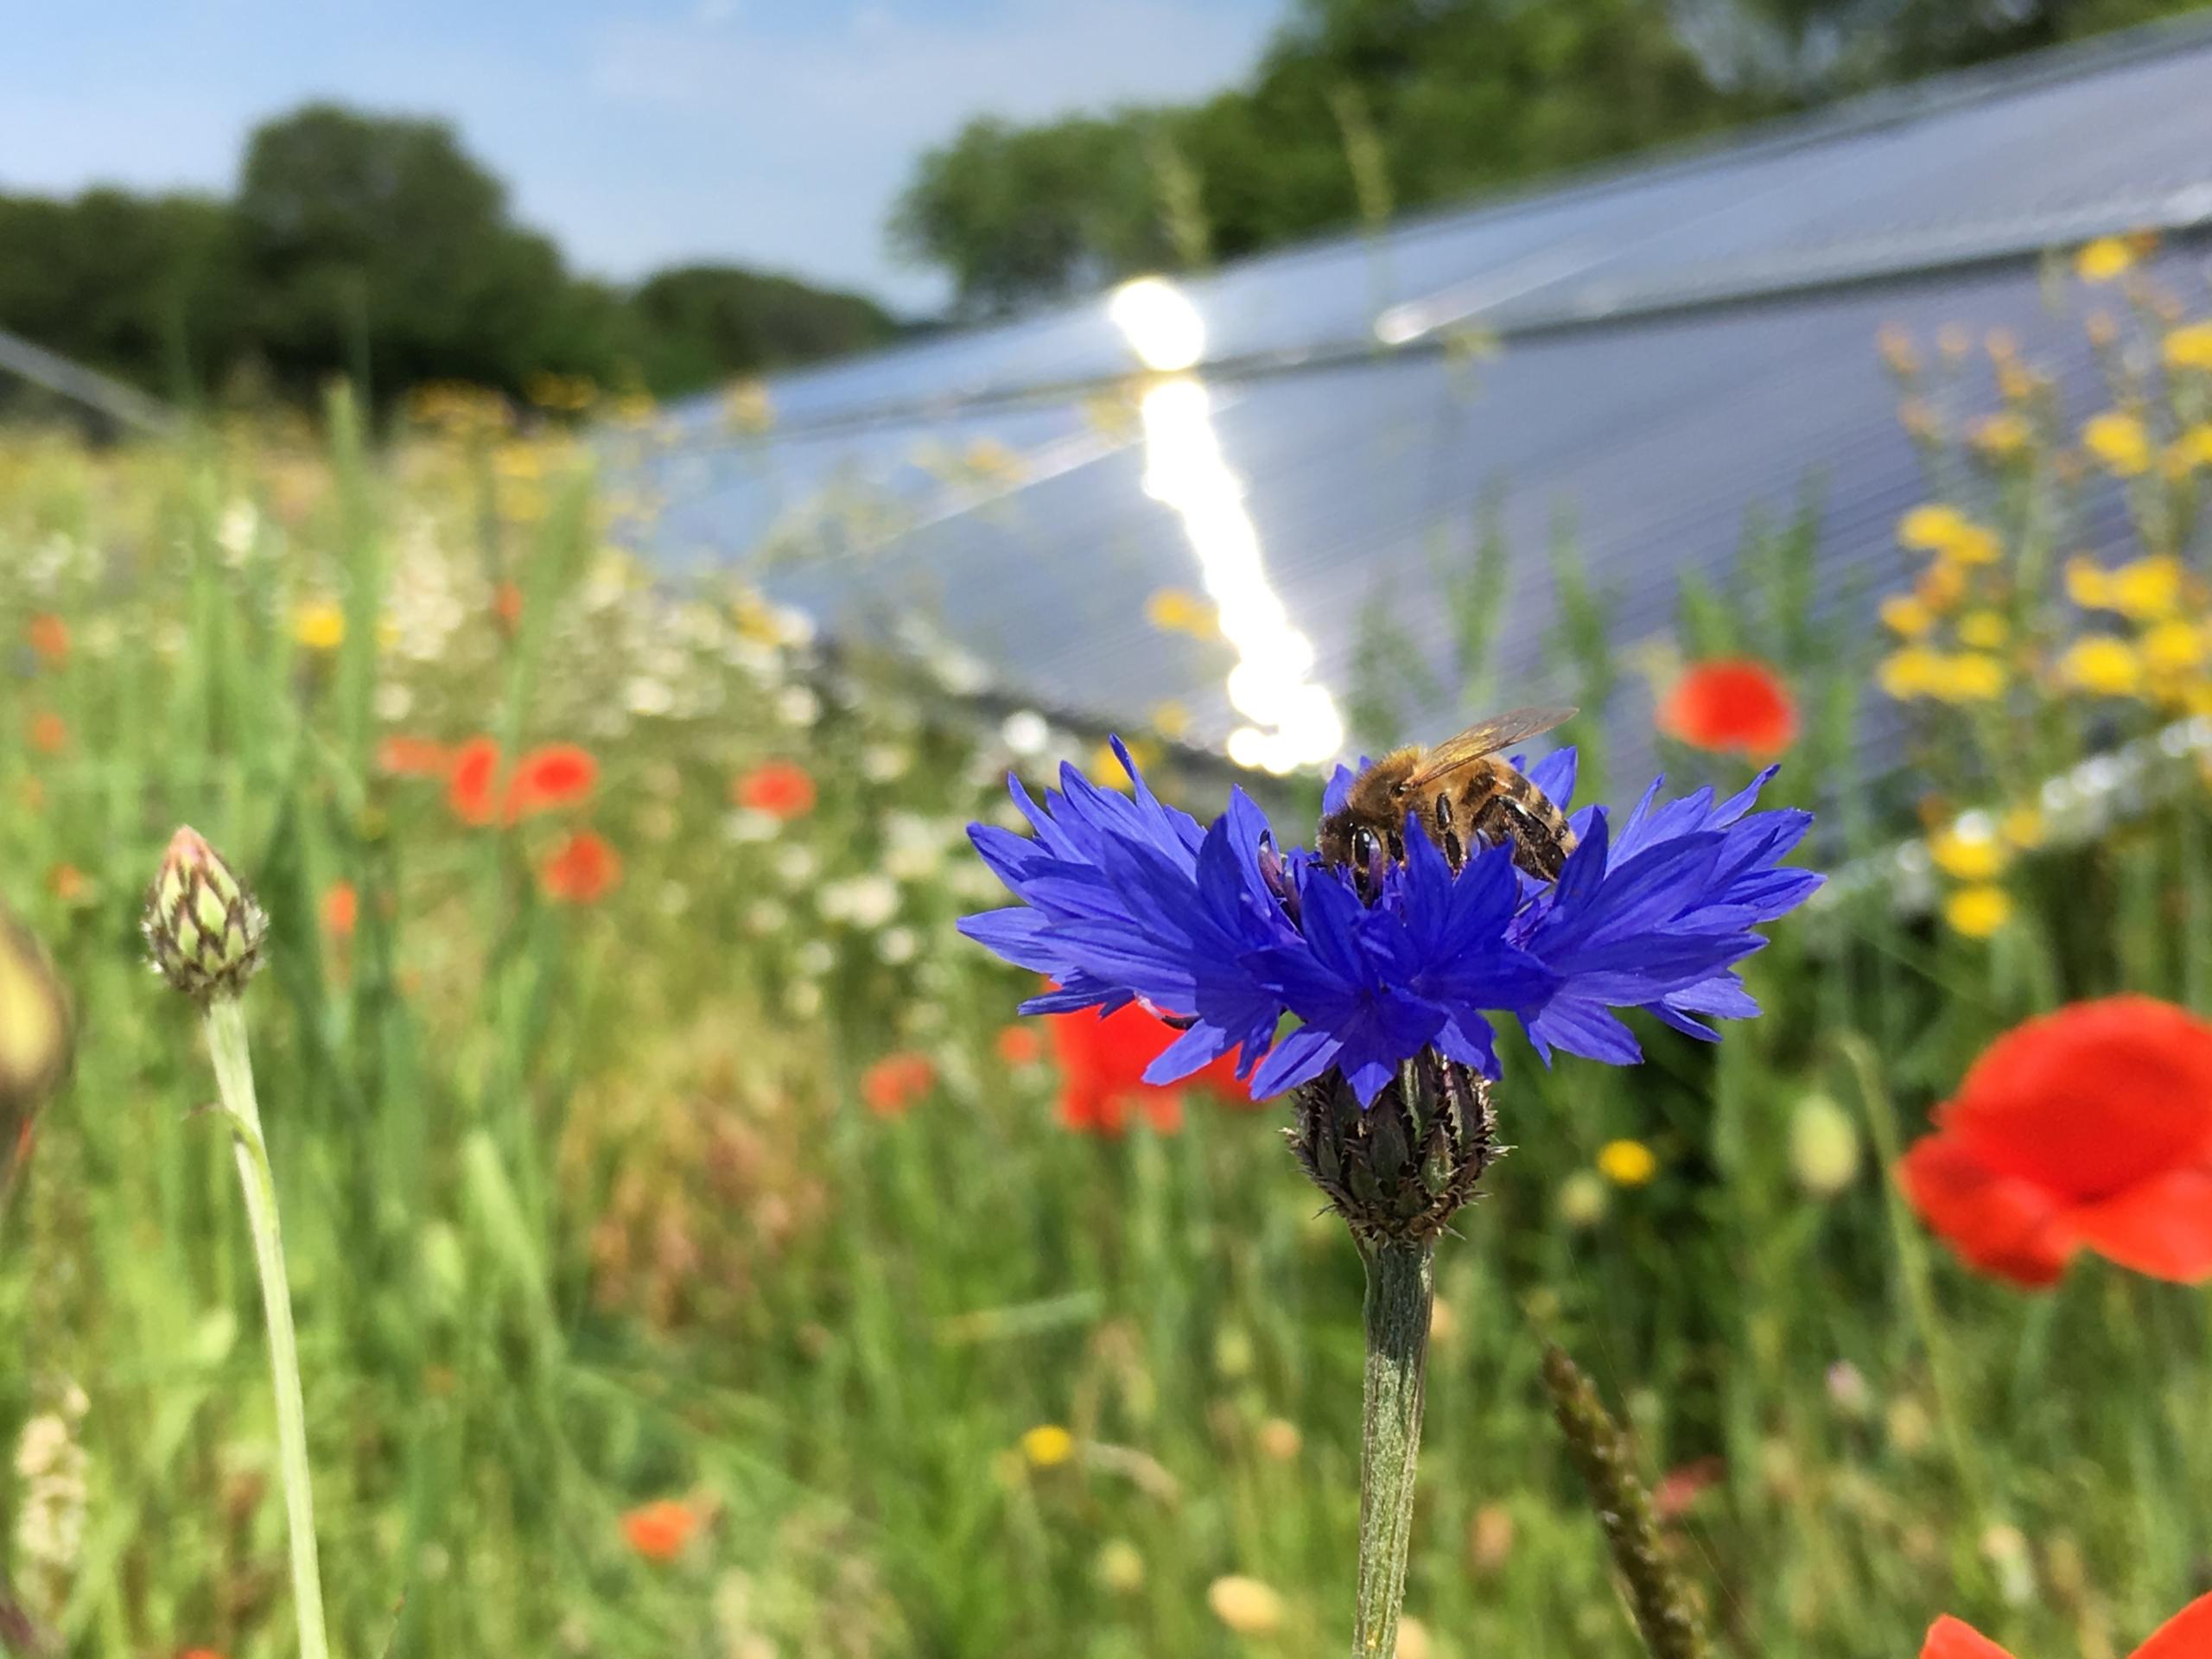 Solarthermie-Blühwiese mit Biene